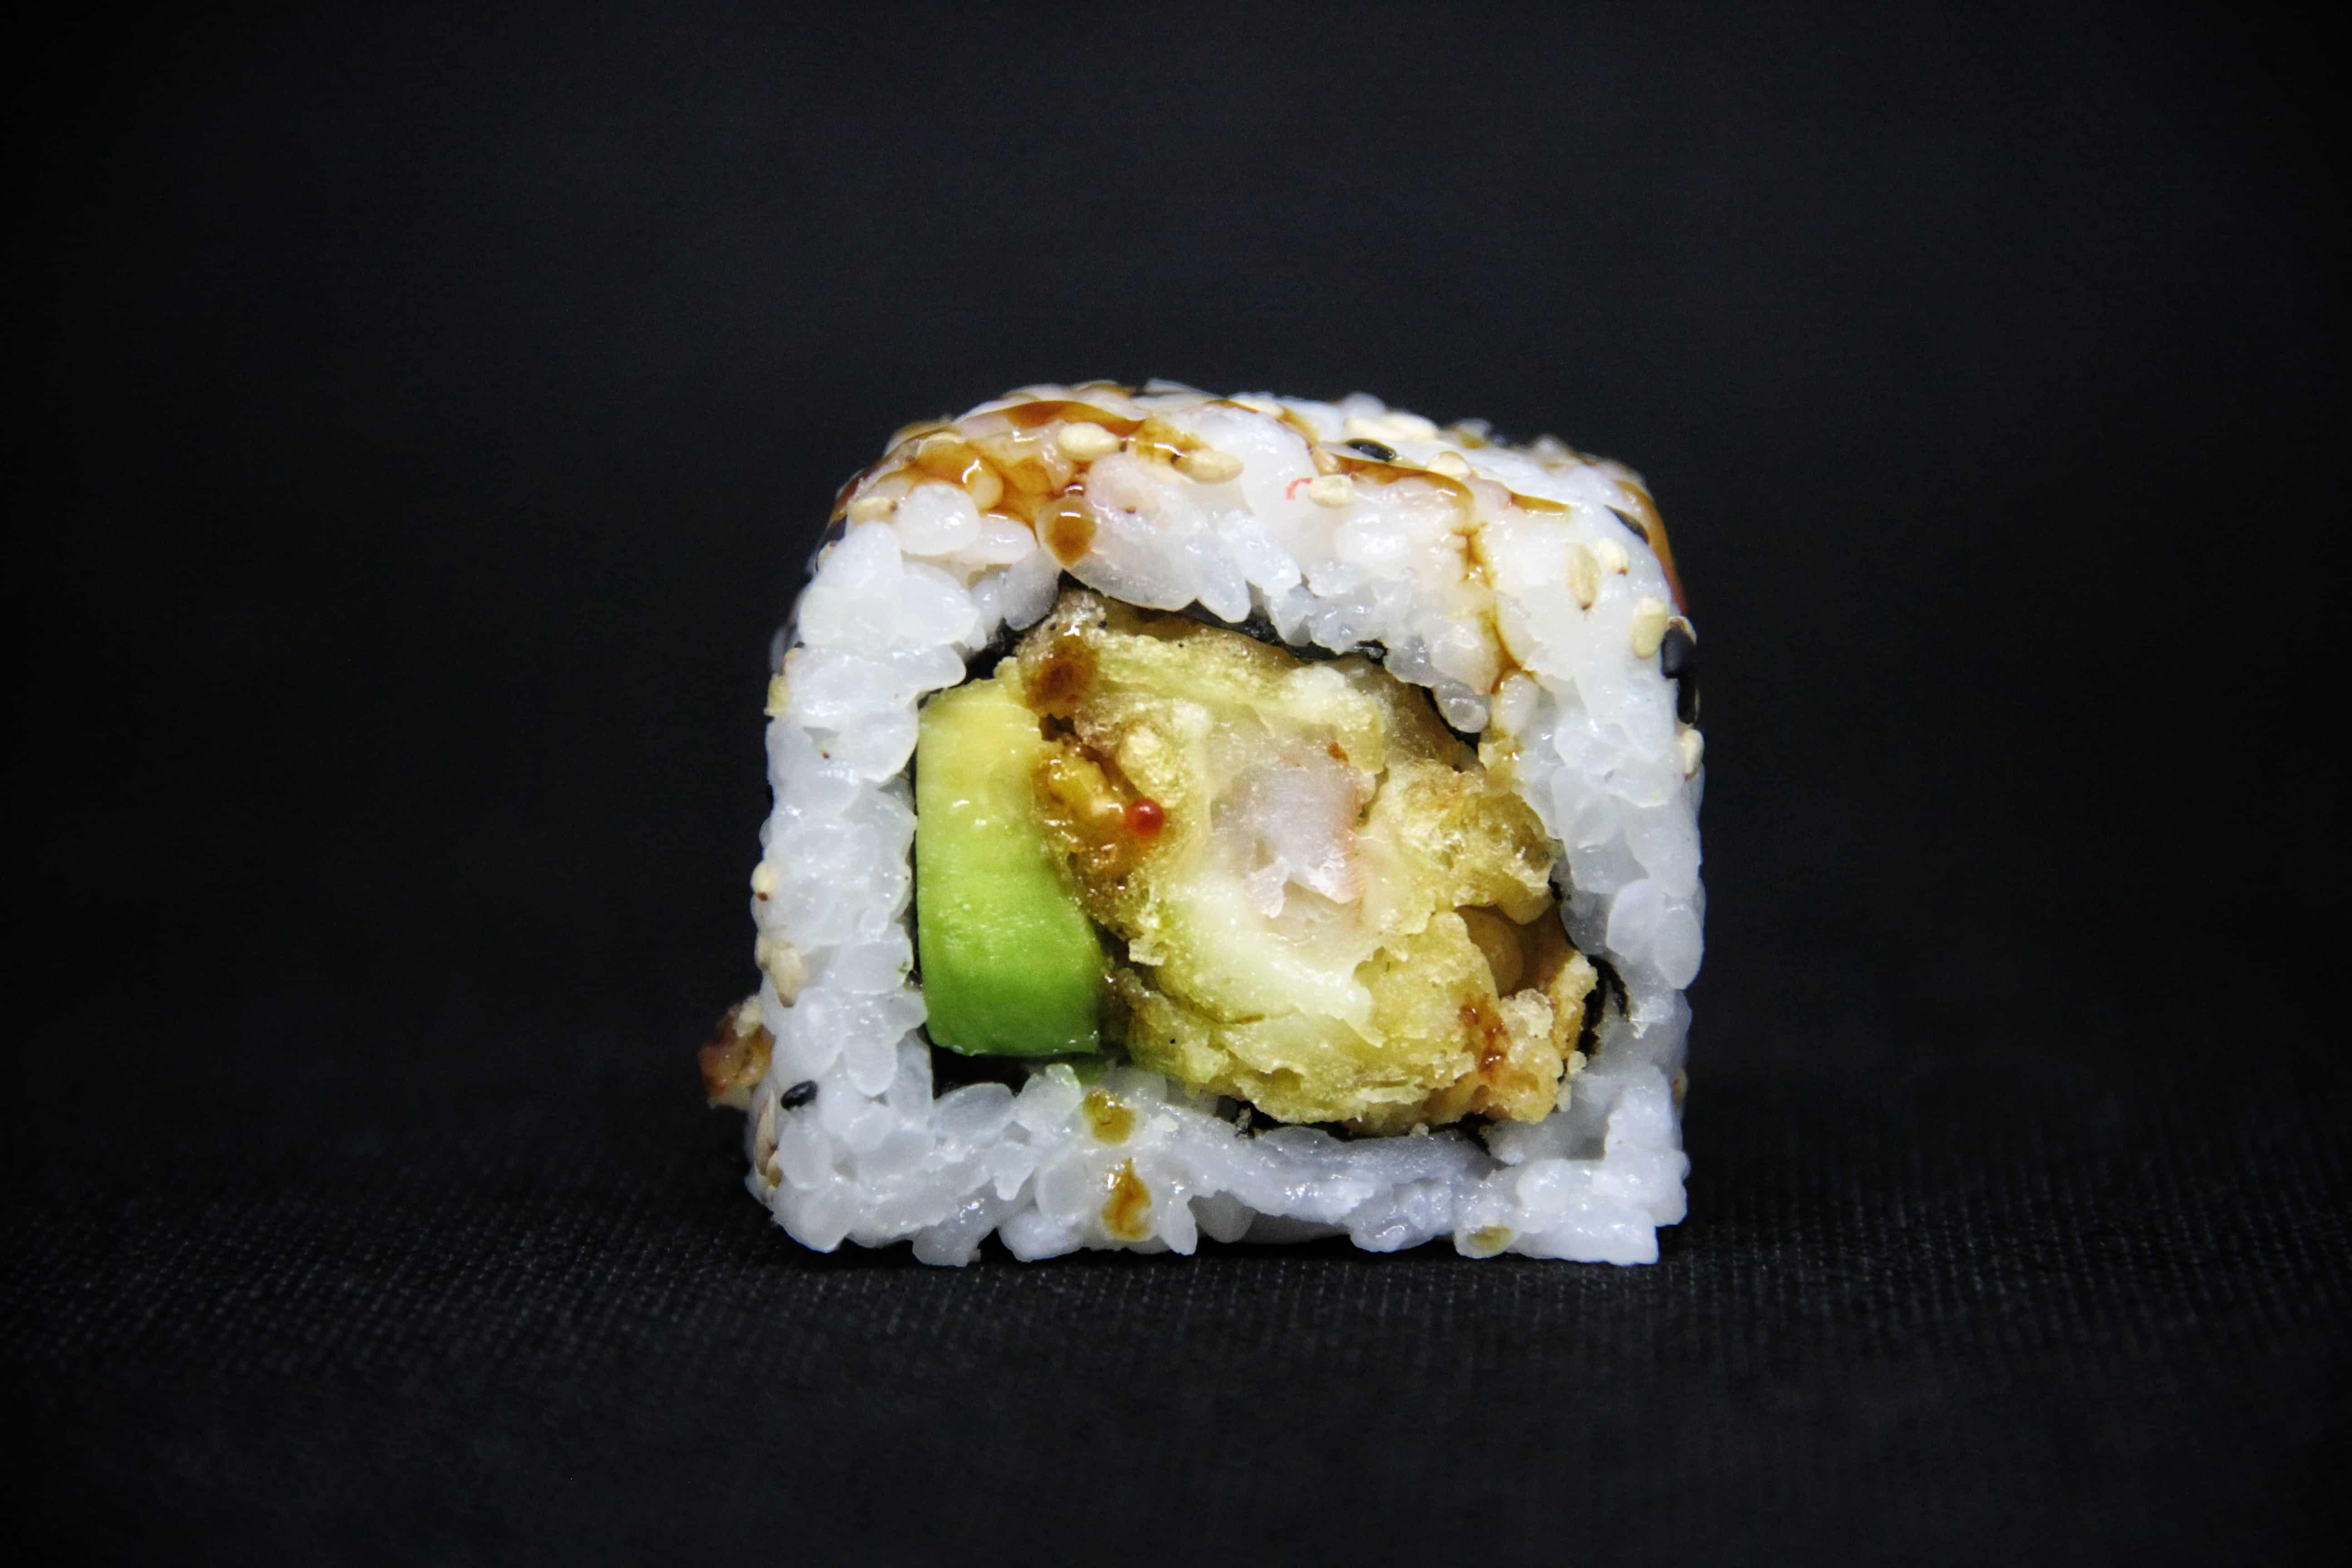 Ricetta Sushi In Tempura.Uramaki Ebi Tempura Sushi In The Box